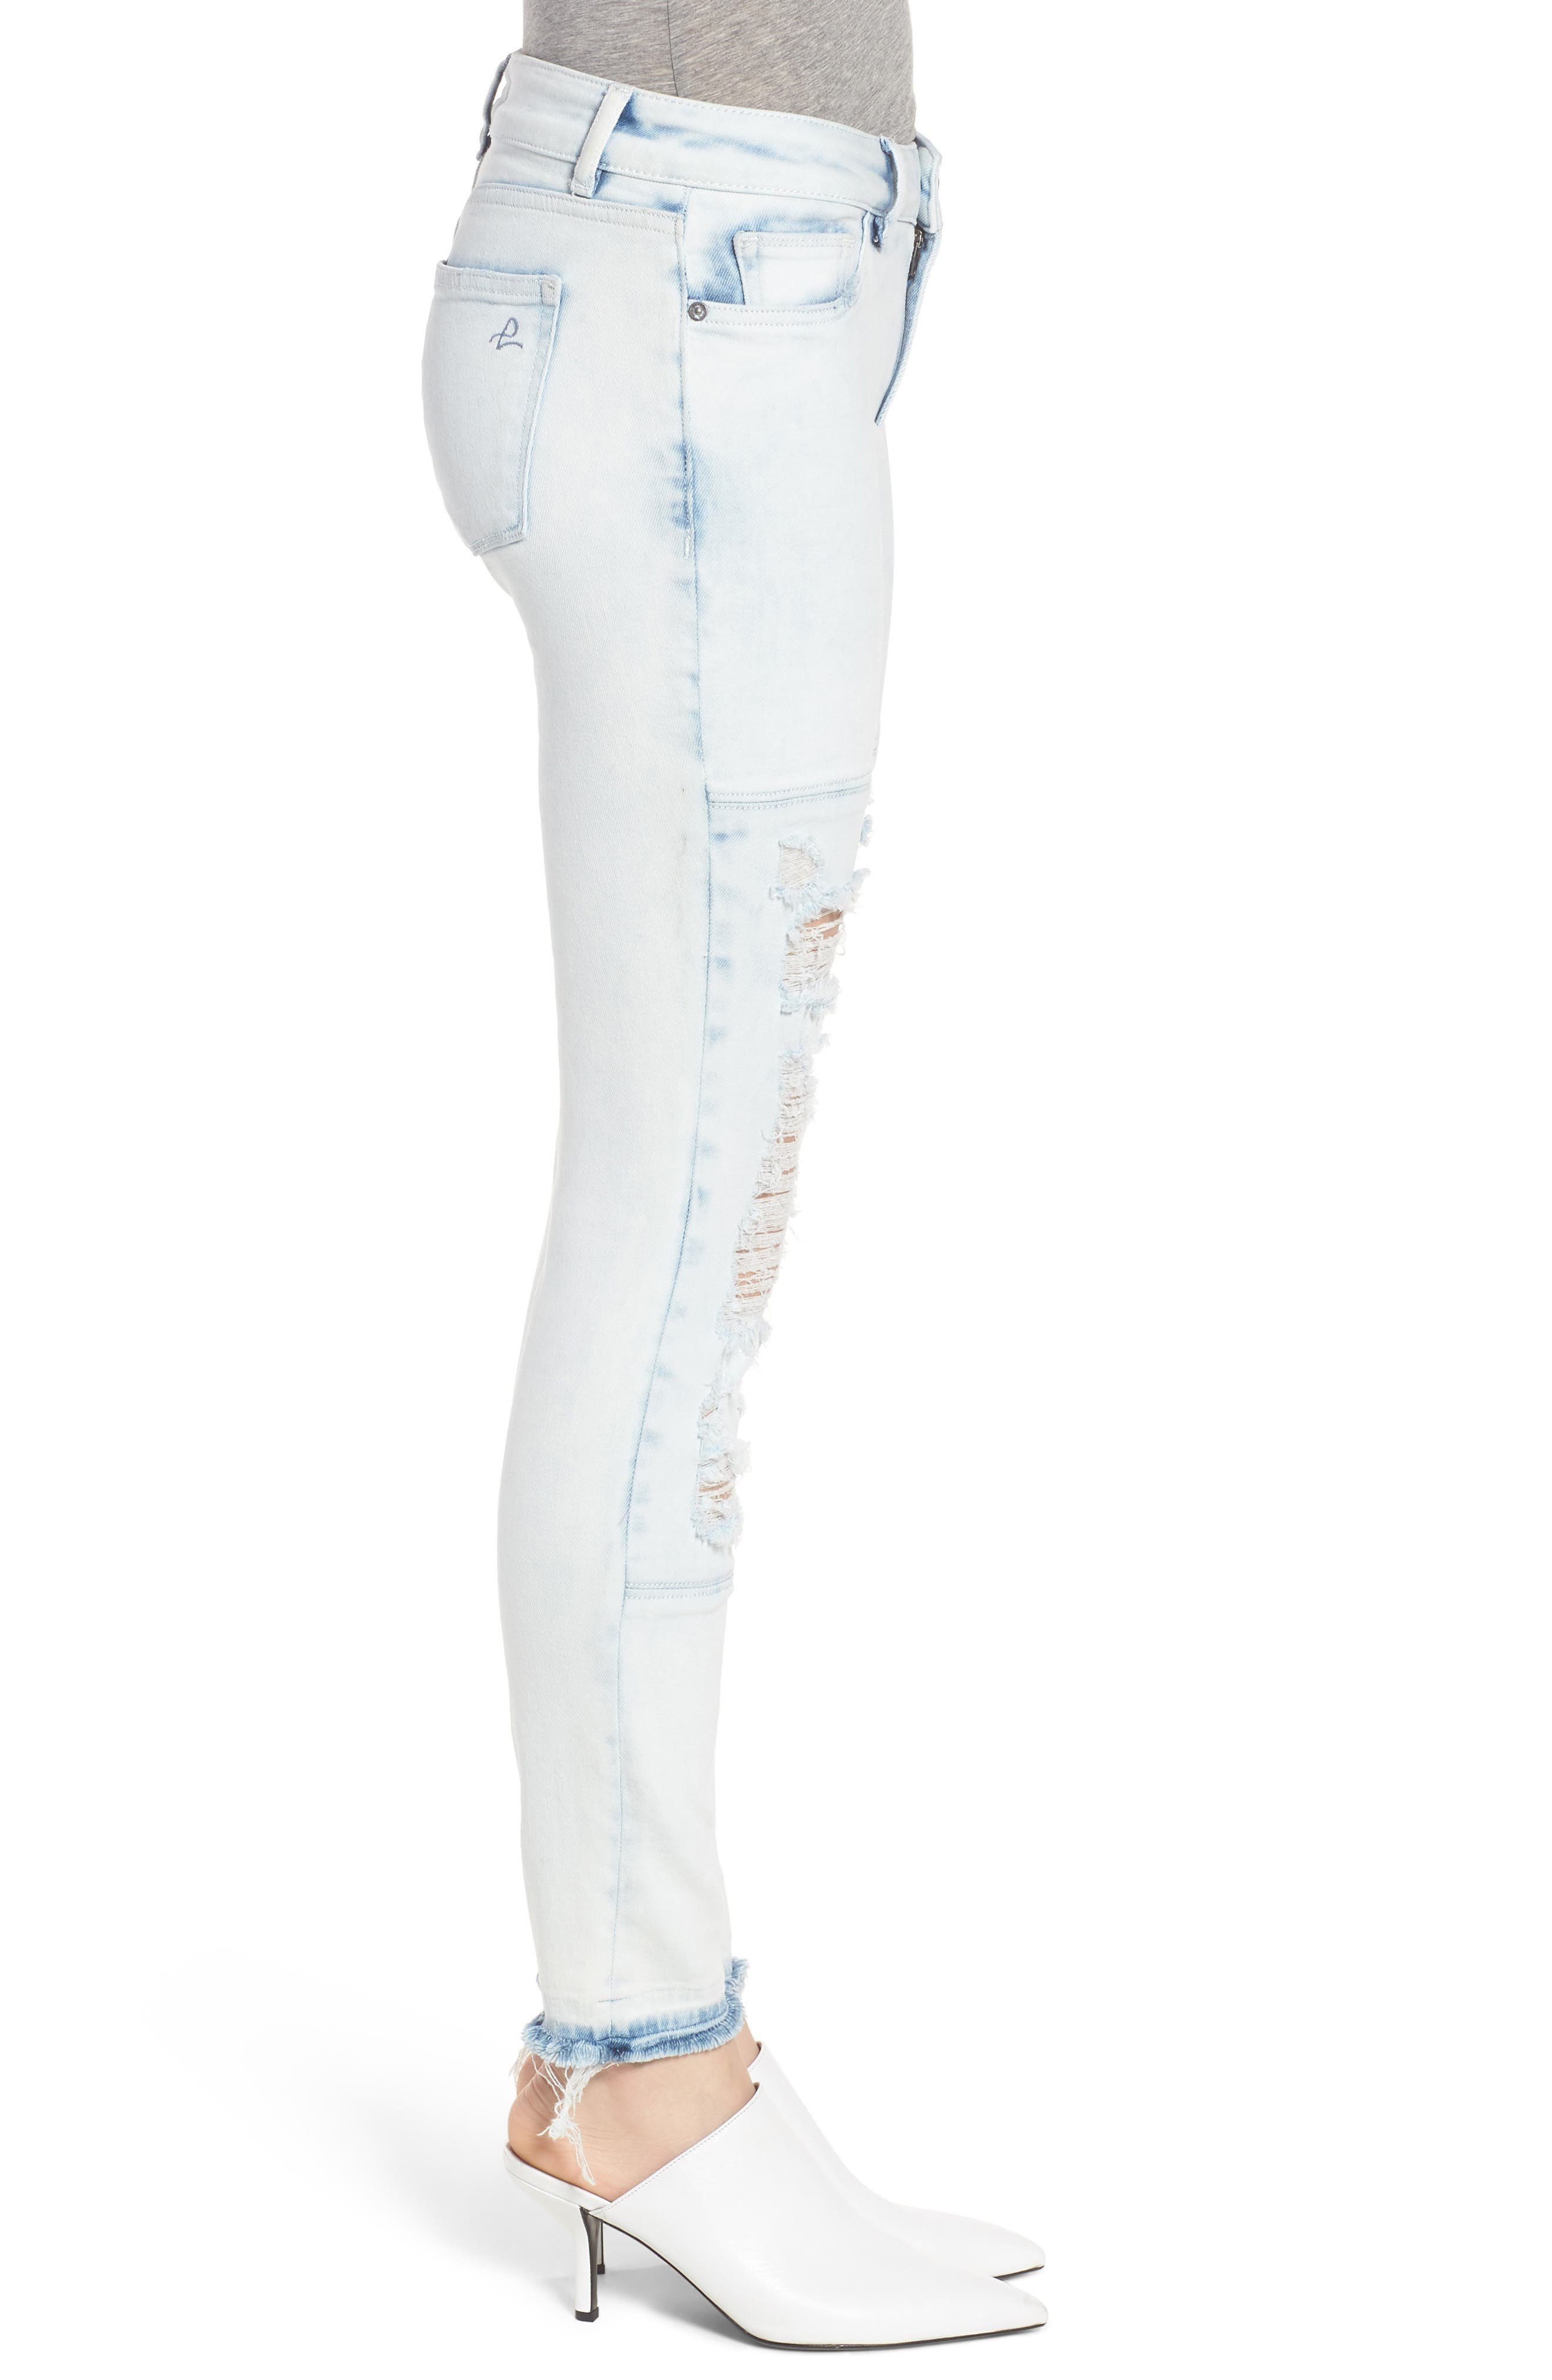 Emma Power Legging Ripped Skinny Jeans,                             Alternate thumbnail 3, color,                             020